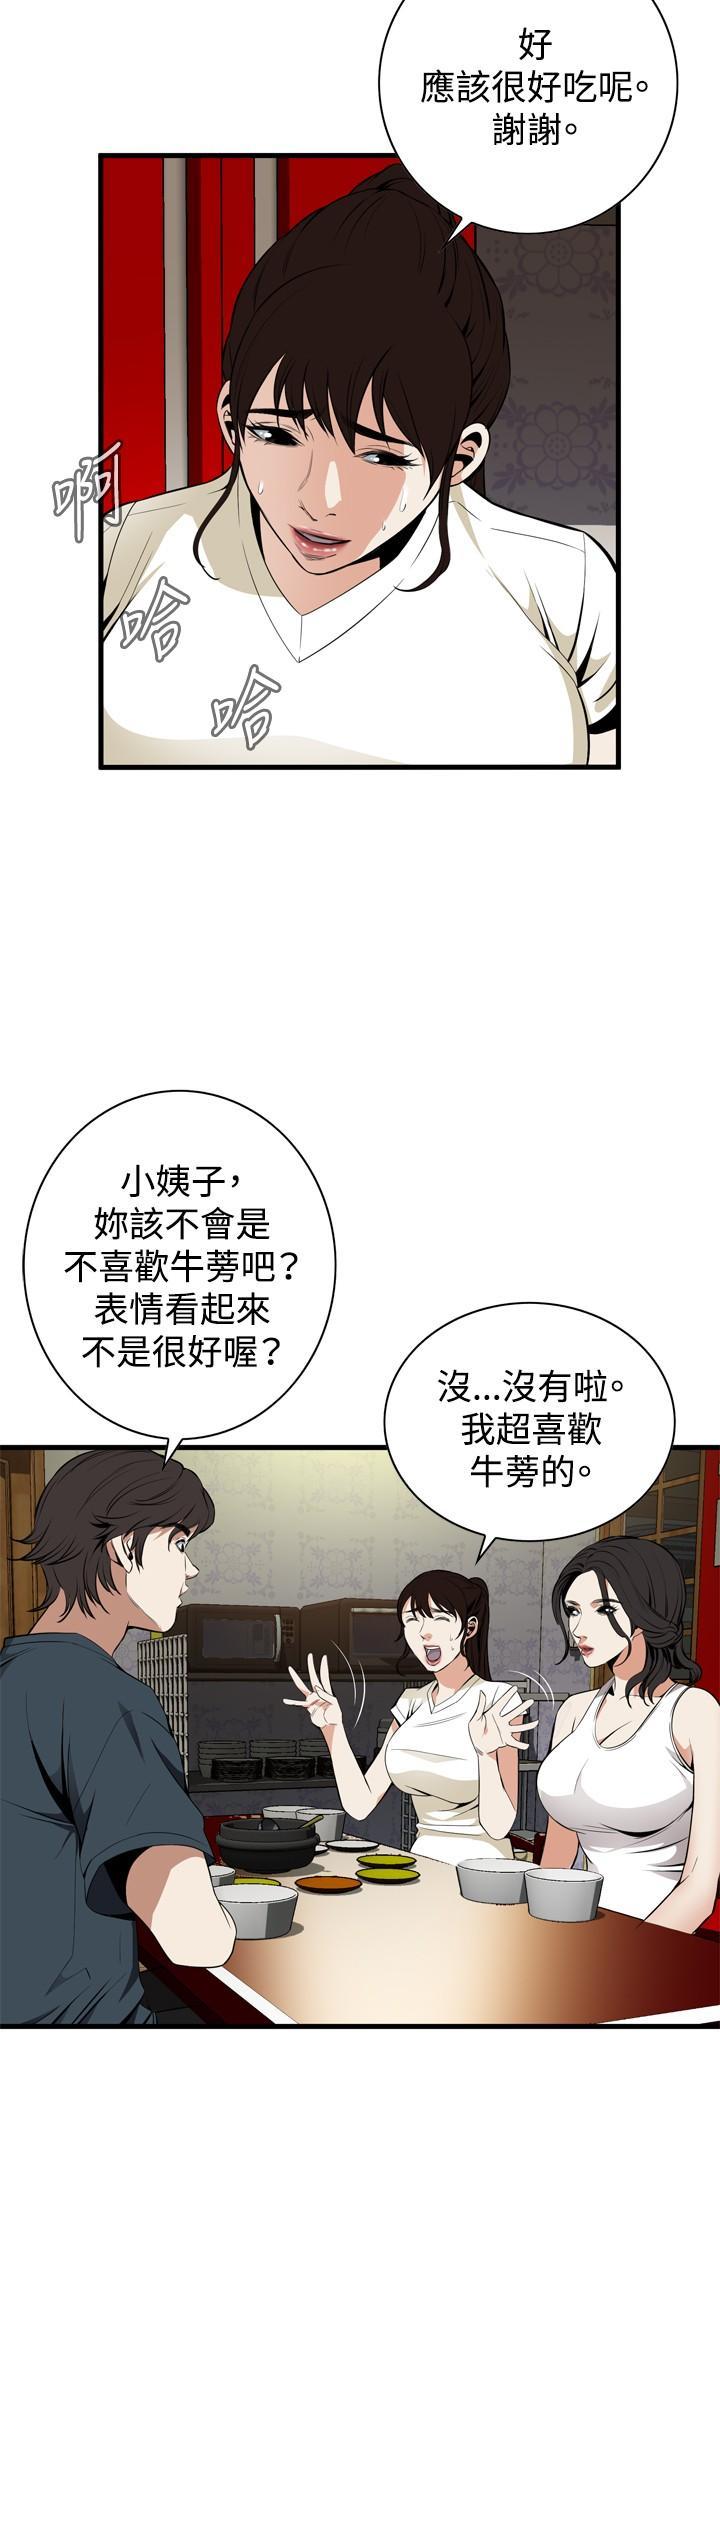 Take a Peek 偷窥 Ch.39~60 [Chinese]中文 139